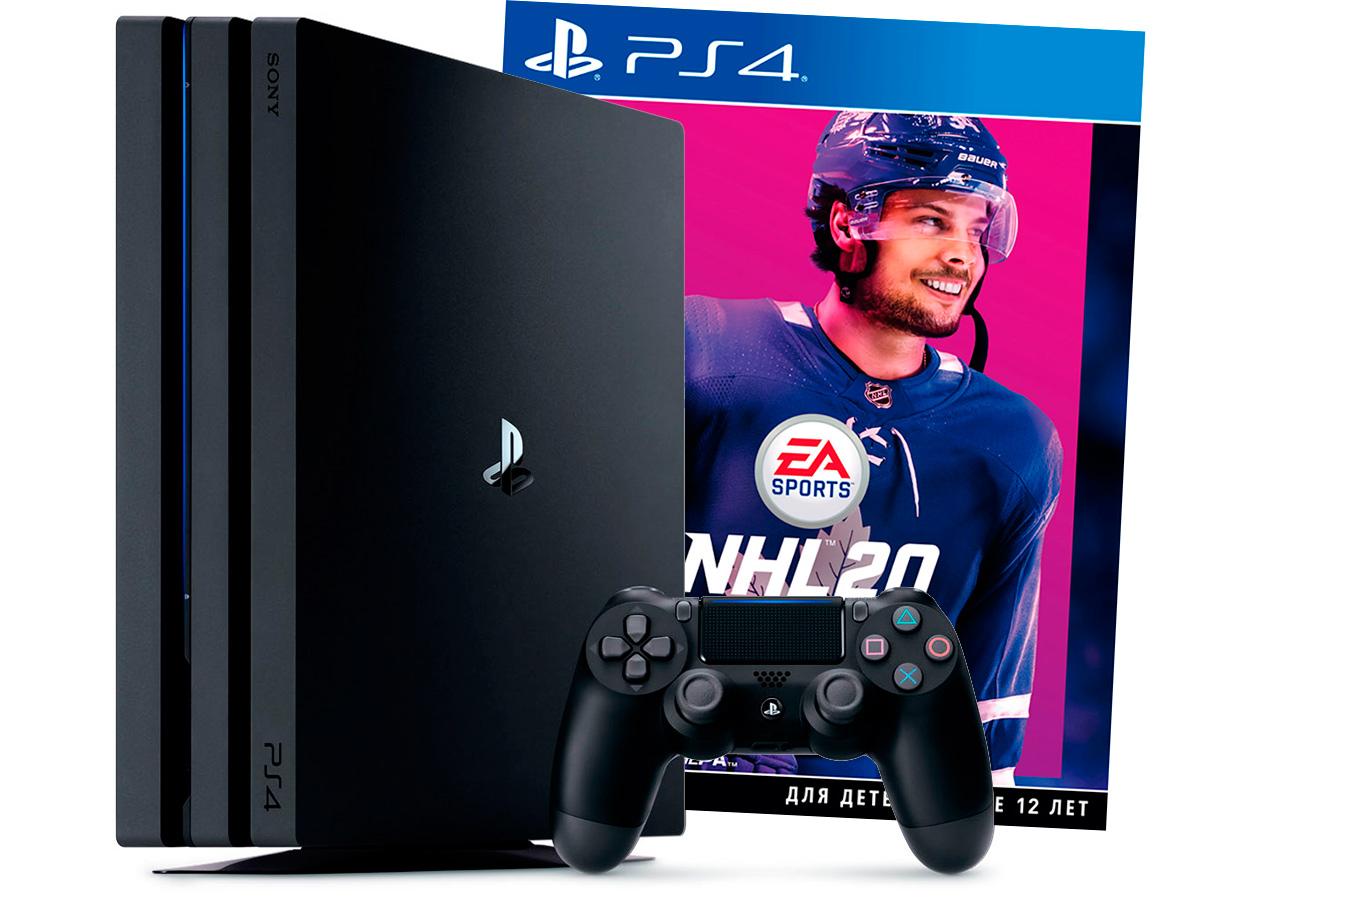 PlayStation 4 Pro приставка с игрой NHL 20 [PS4P1N20]